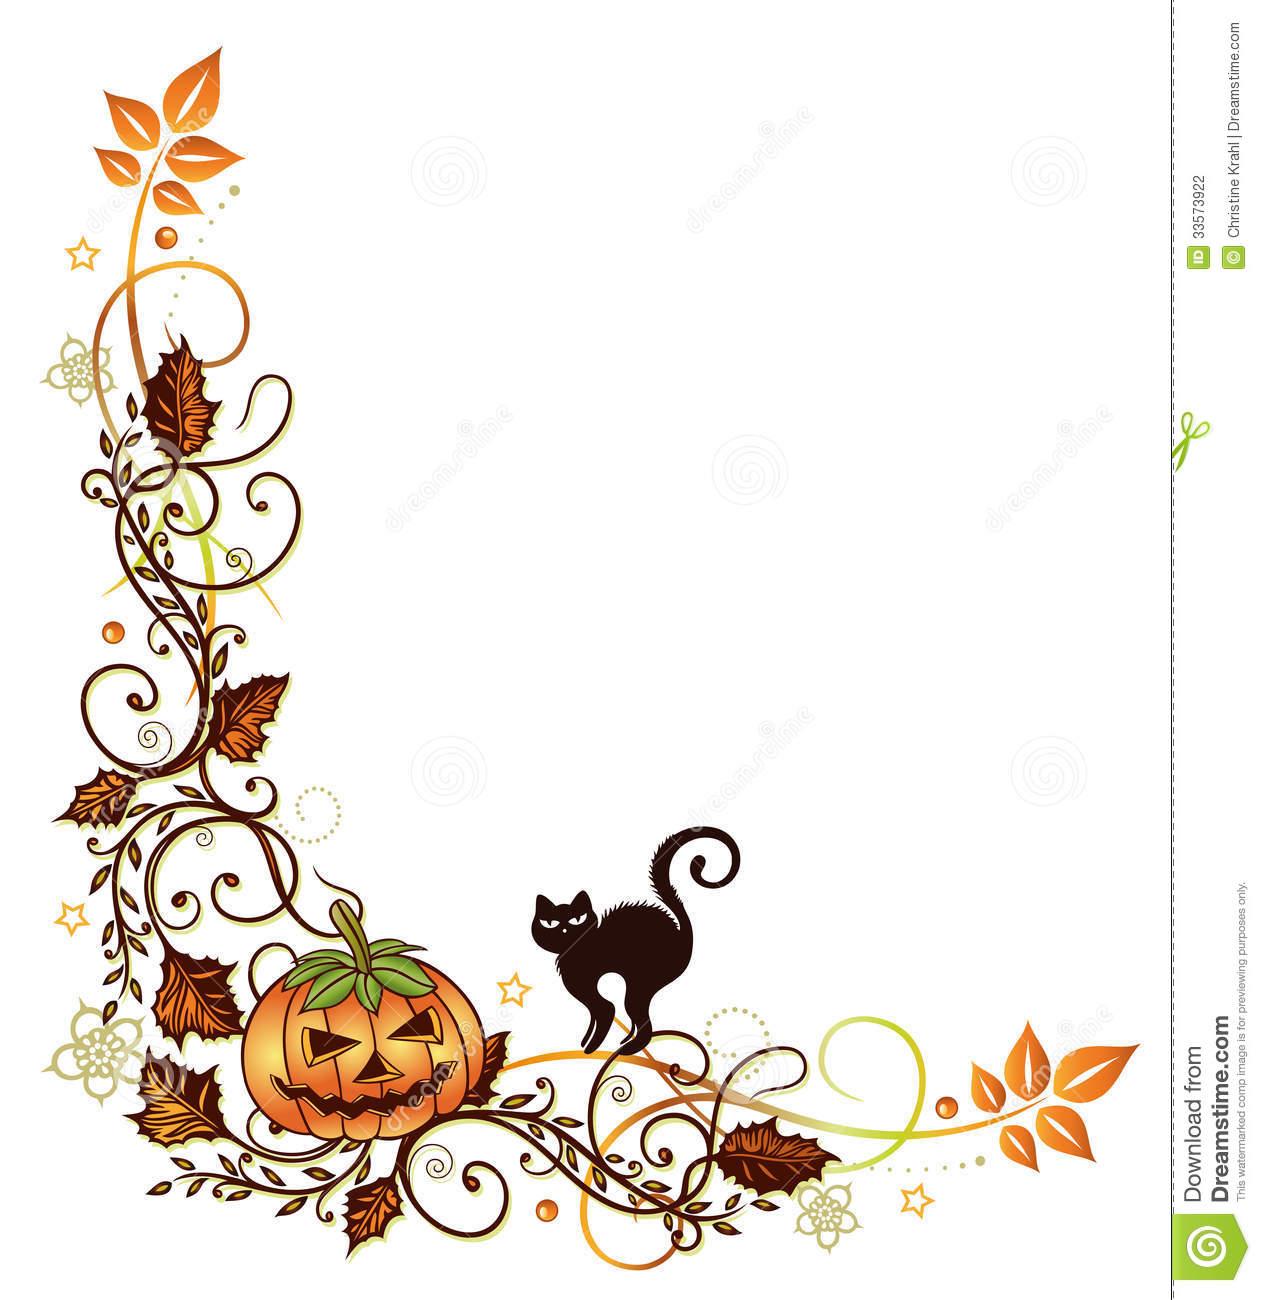 halloween border clipart-halloween border clipart-3